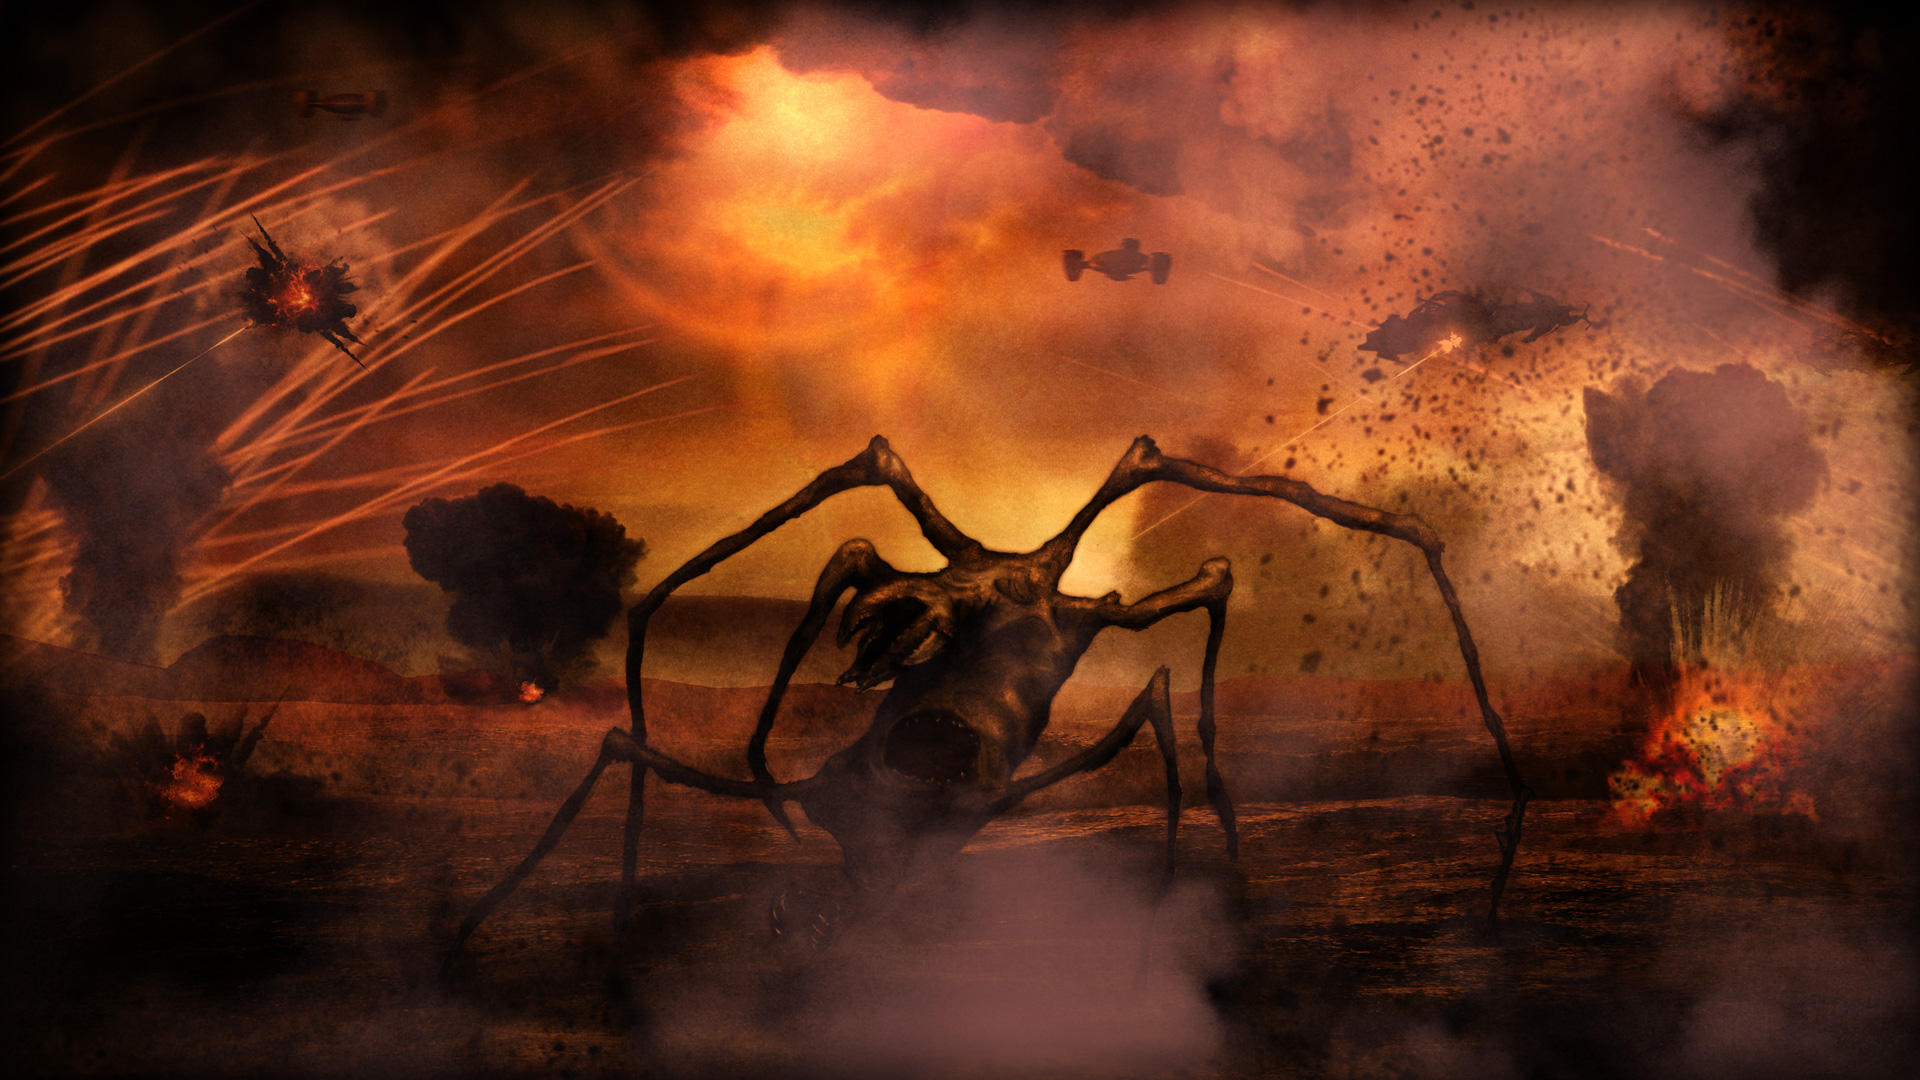 An X-Class Demon pushes on under heavy fire from U.S Fieldships.